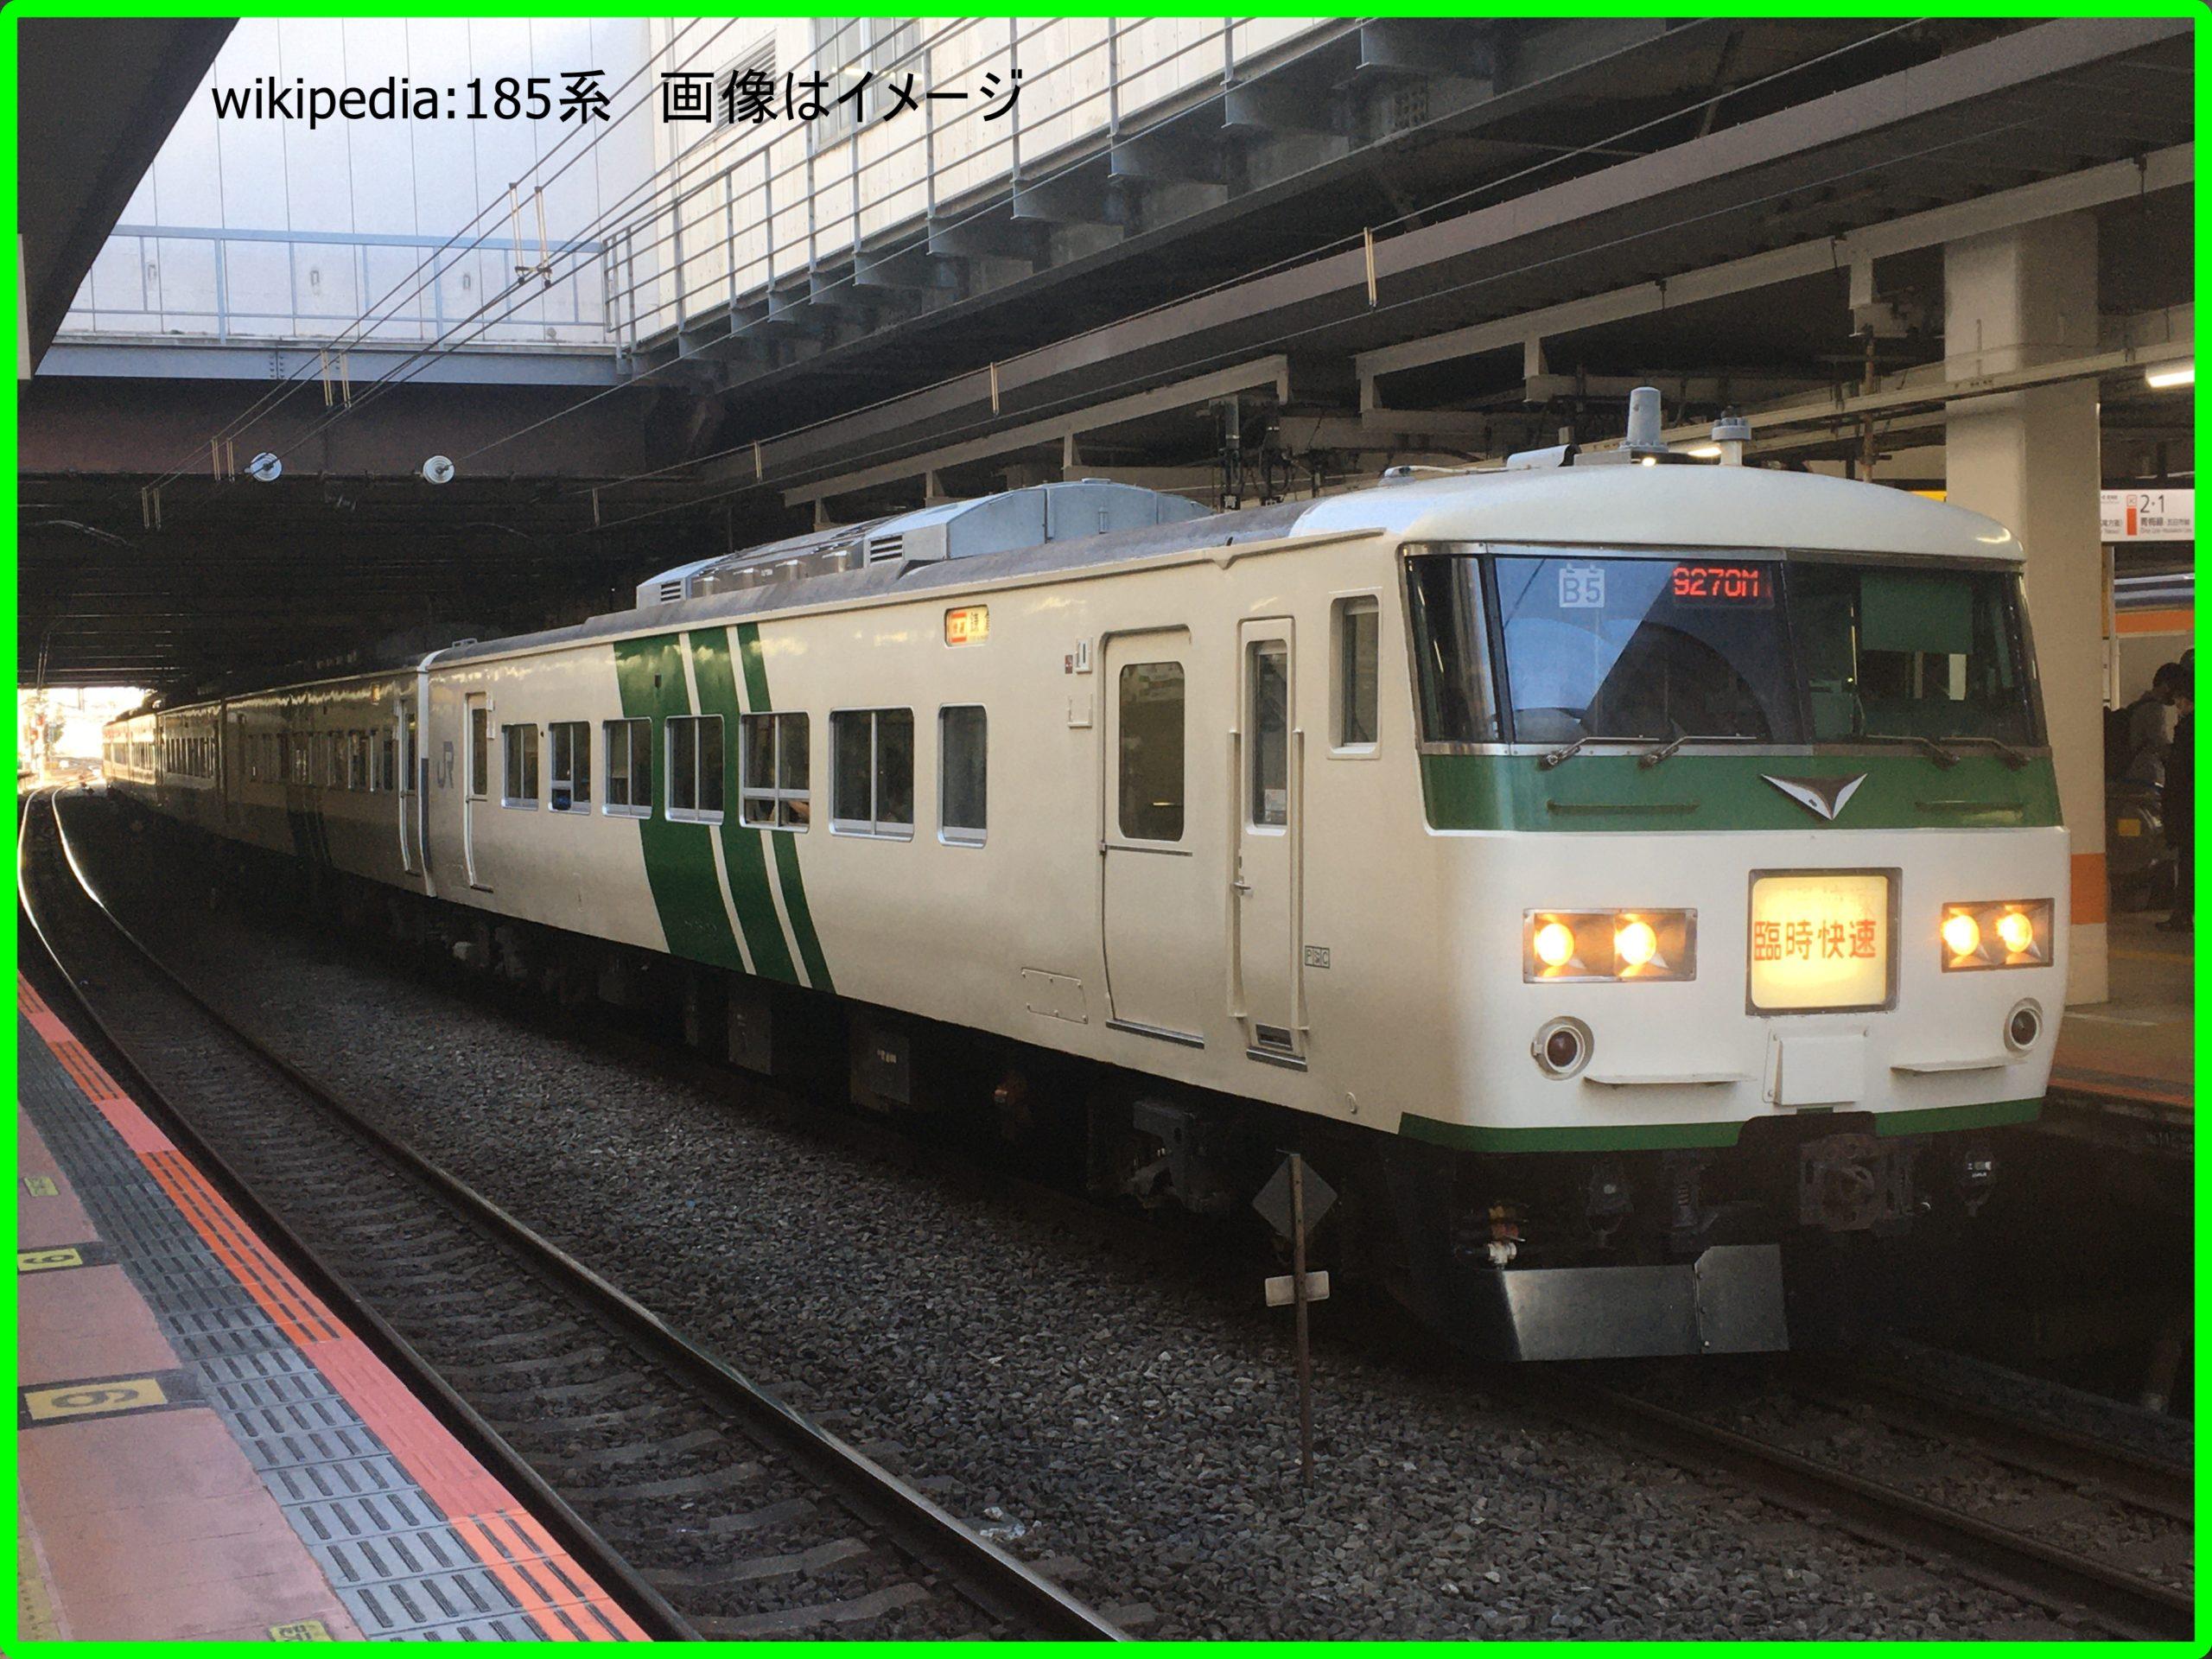 【JR東日本】終夜運転2021取りやめへ  初日の出号も中止か